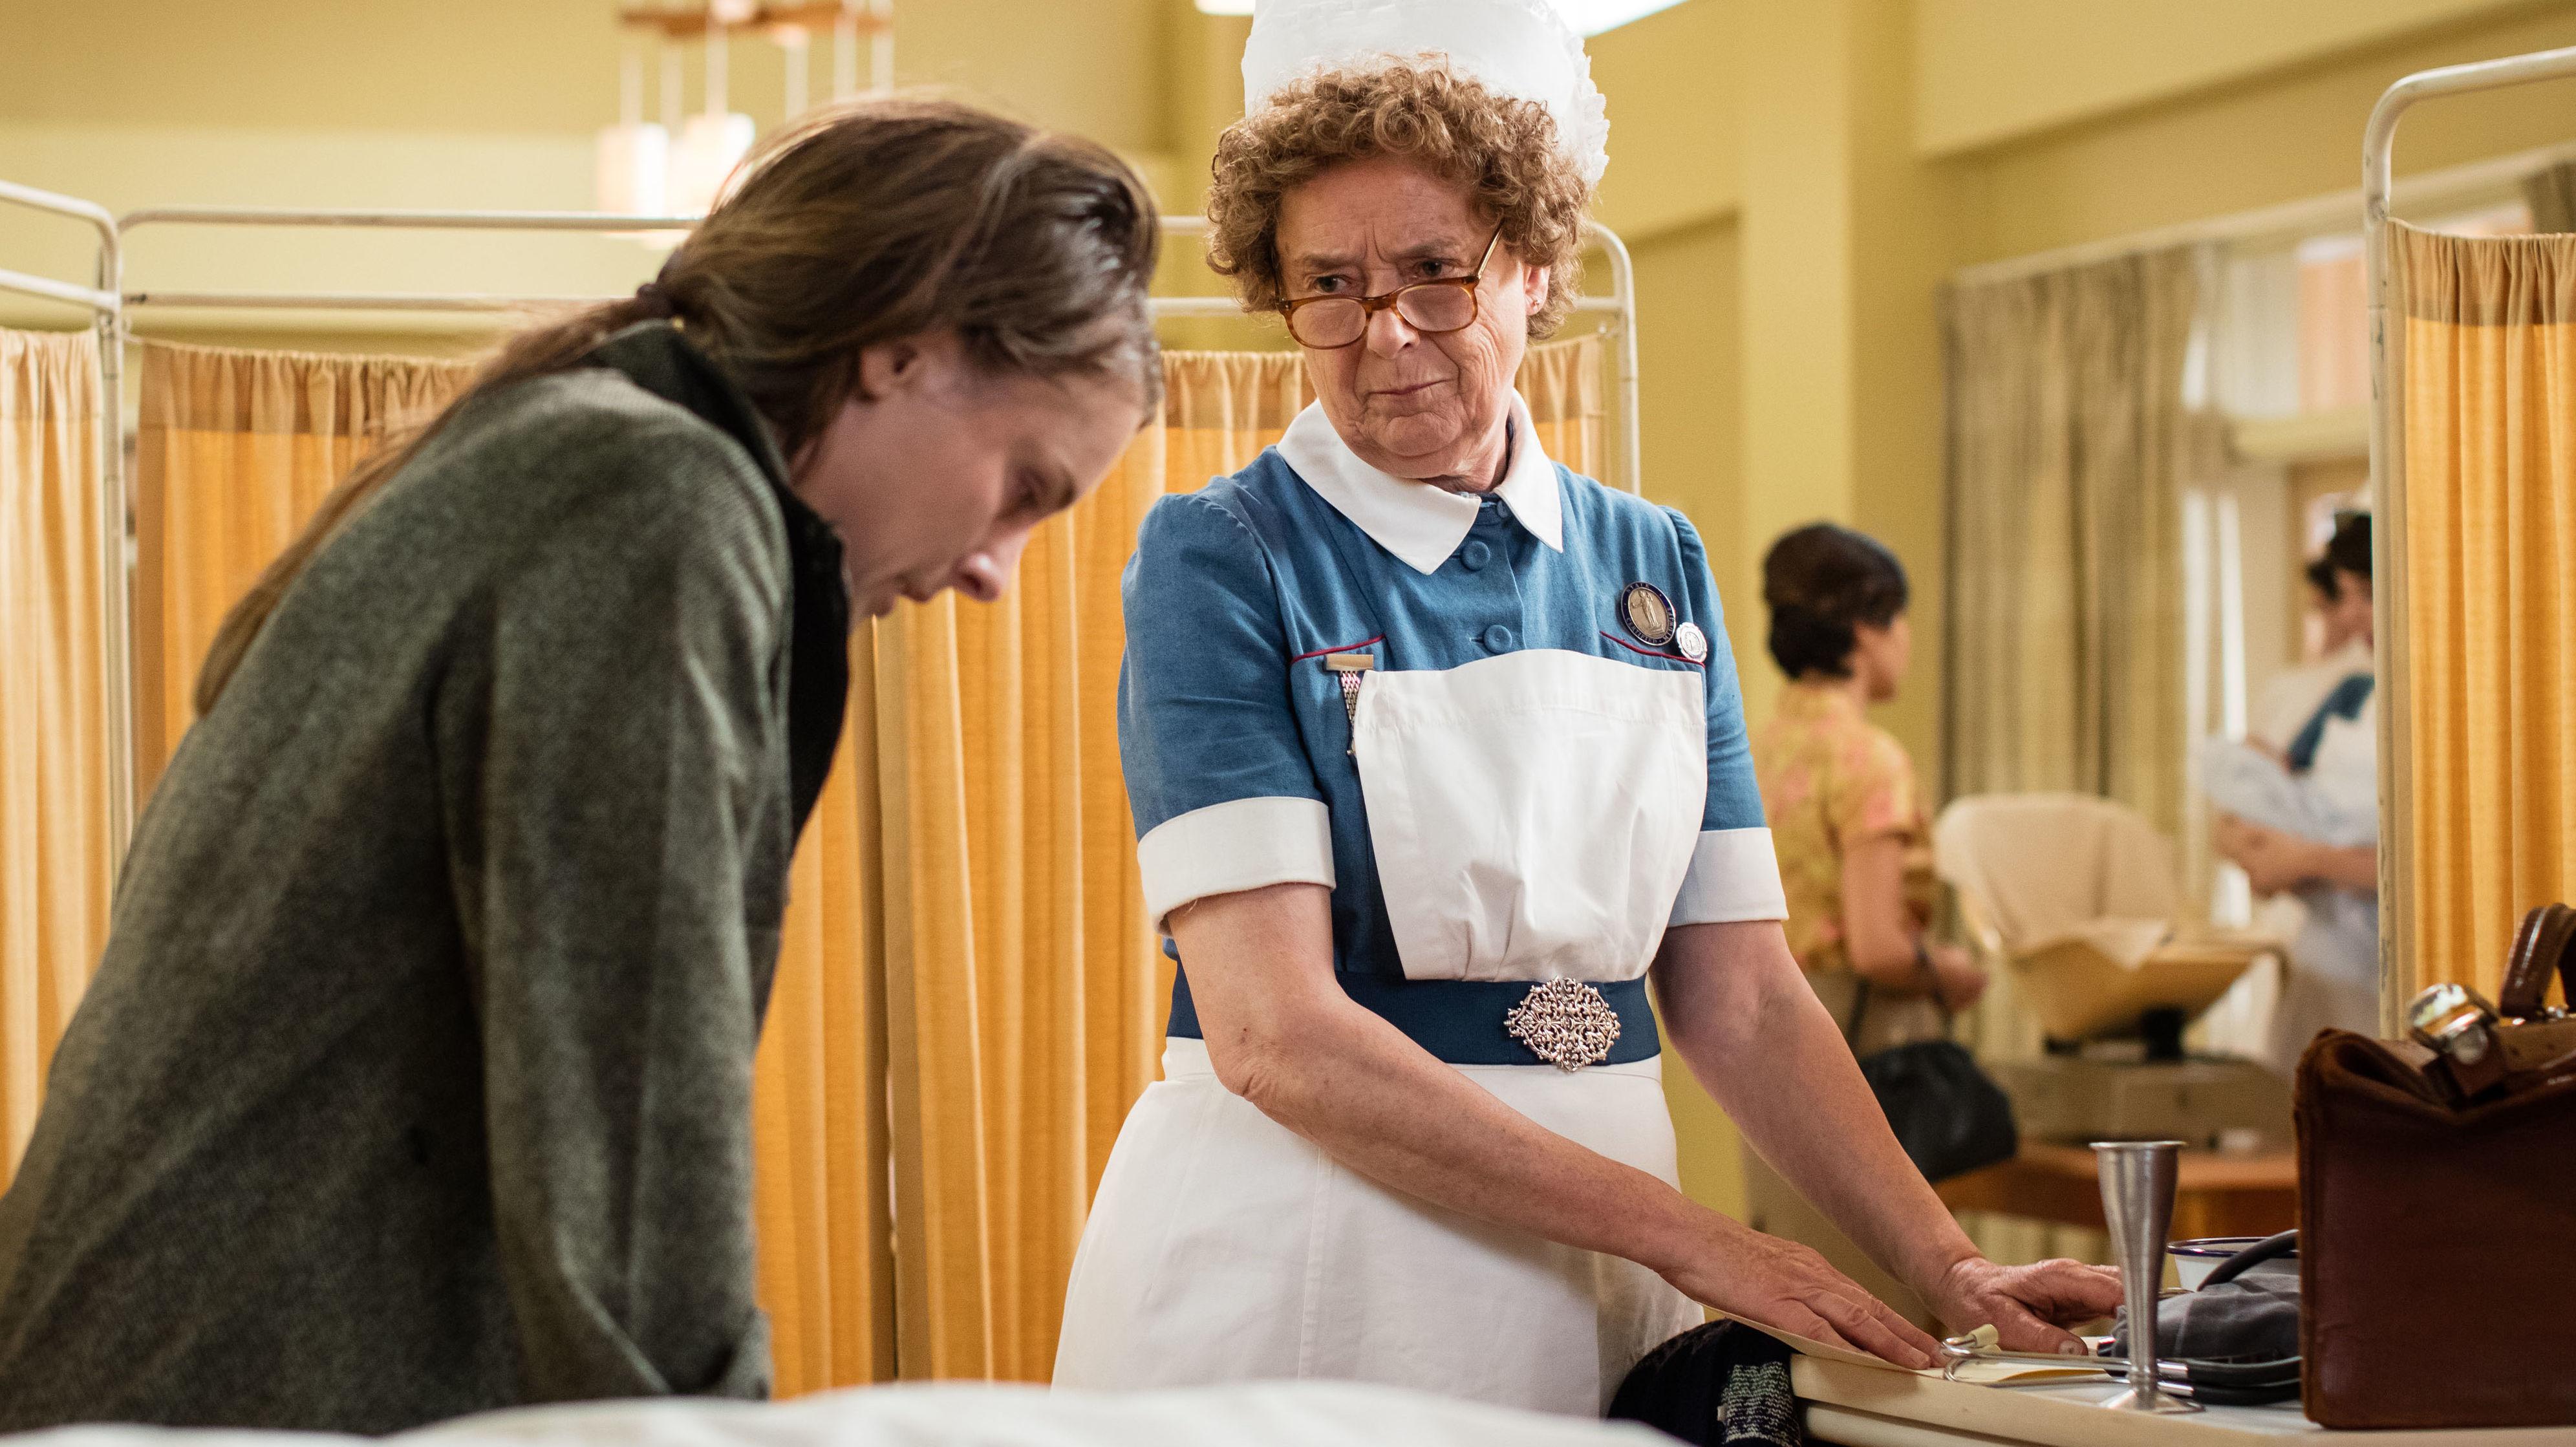 b3c62abcc3538 Call the Midwife: Season 7, Episode 3 Recap | Blog | THIRTEEN - New York  Public Media